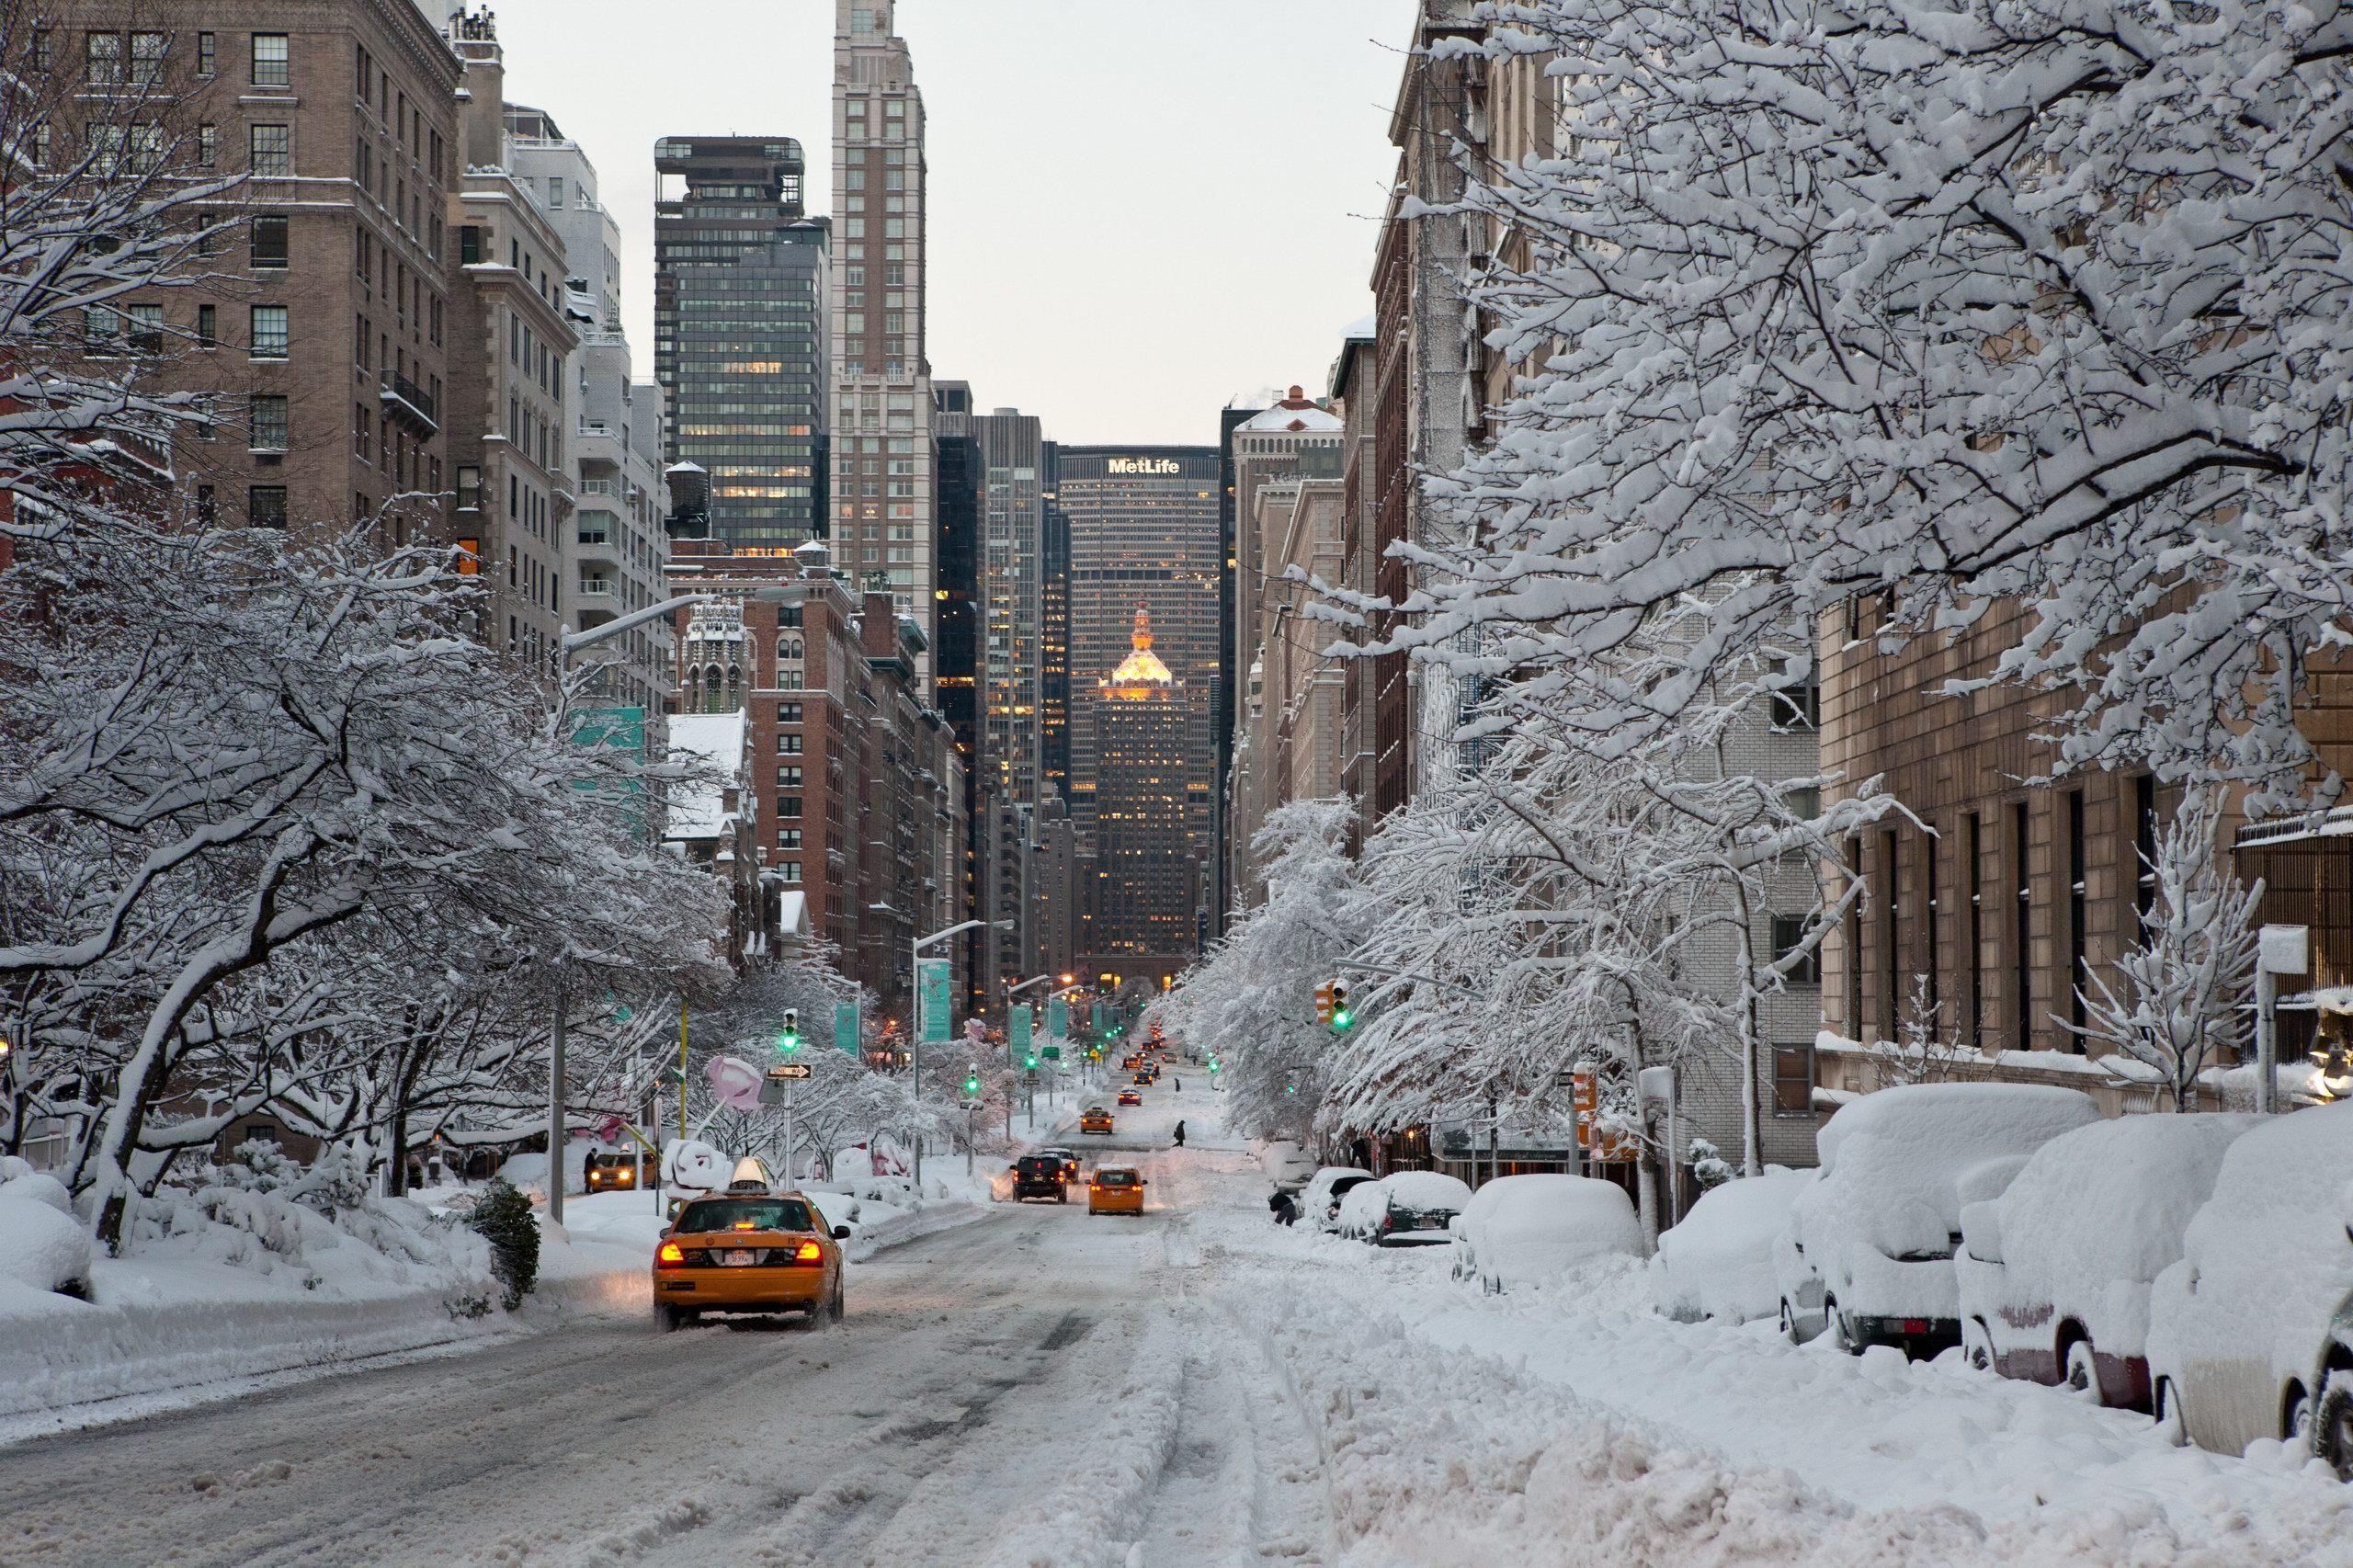 Stati Uniti: New York città fantasma sotto la neve